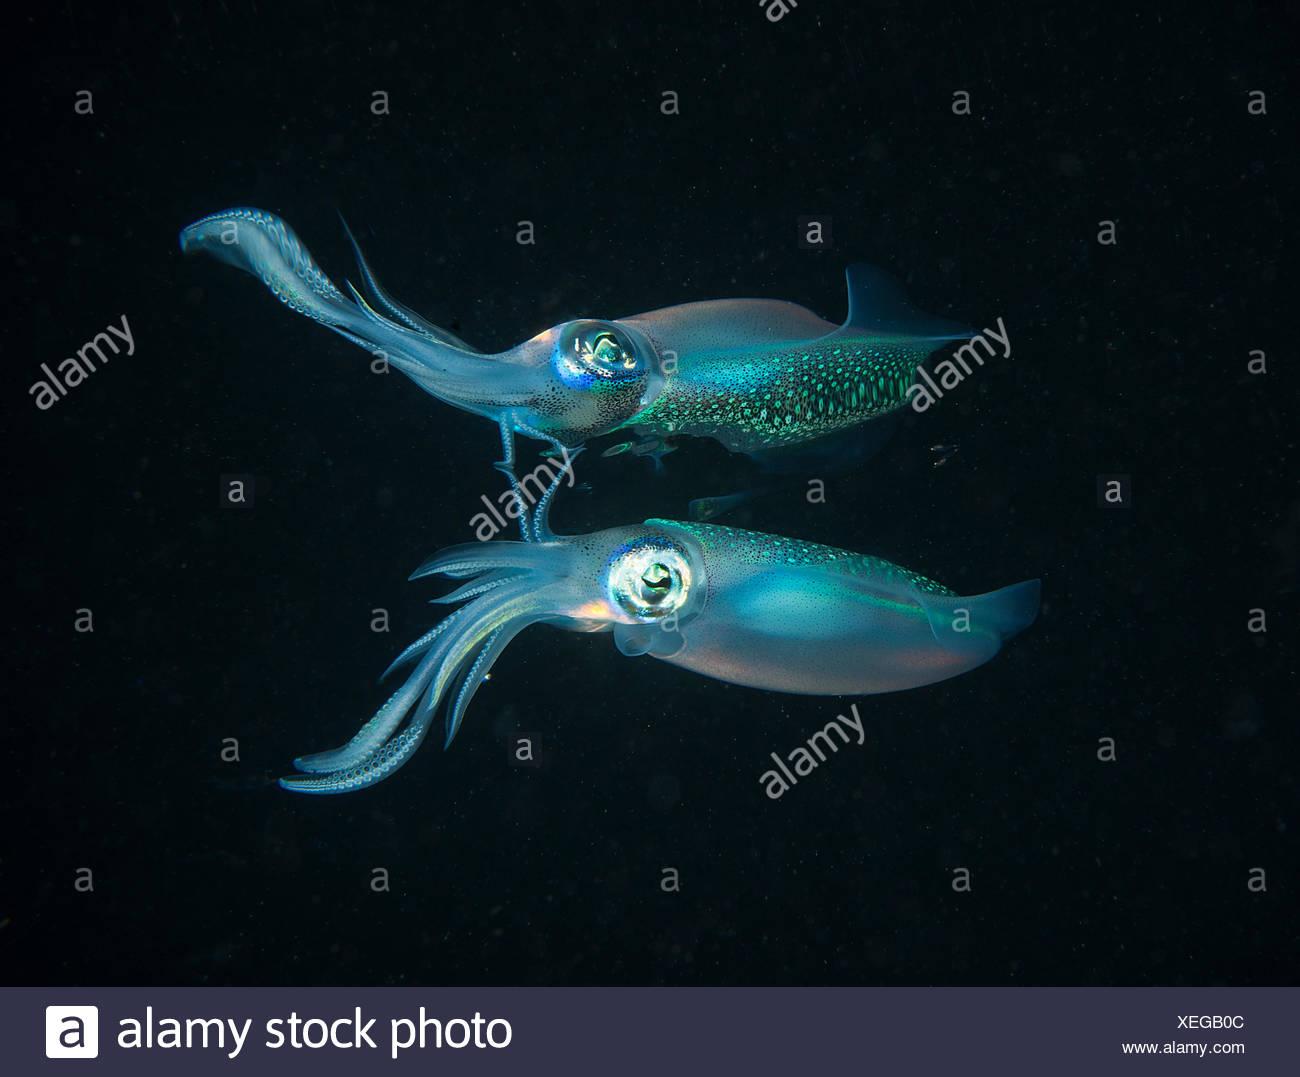 Longfin reefsquid with surface reflexion - Fiji Islands - Stock Image